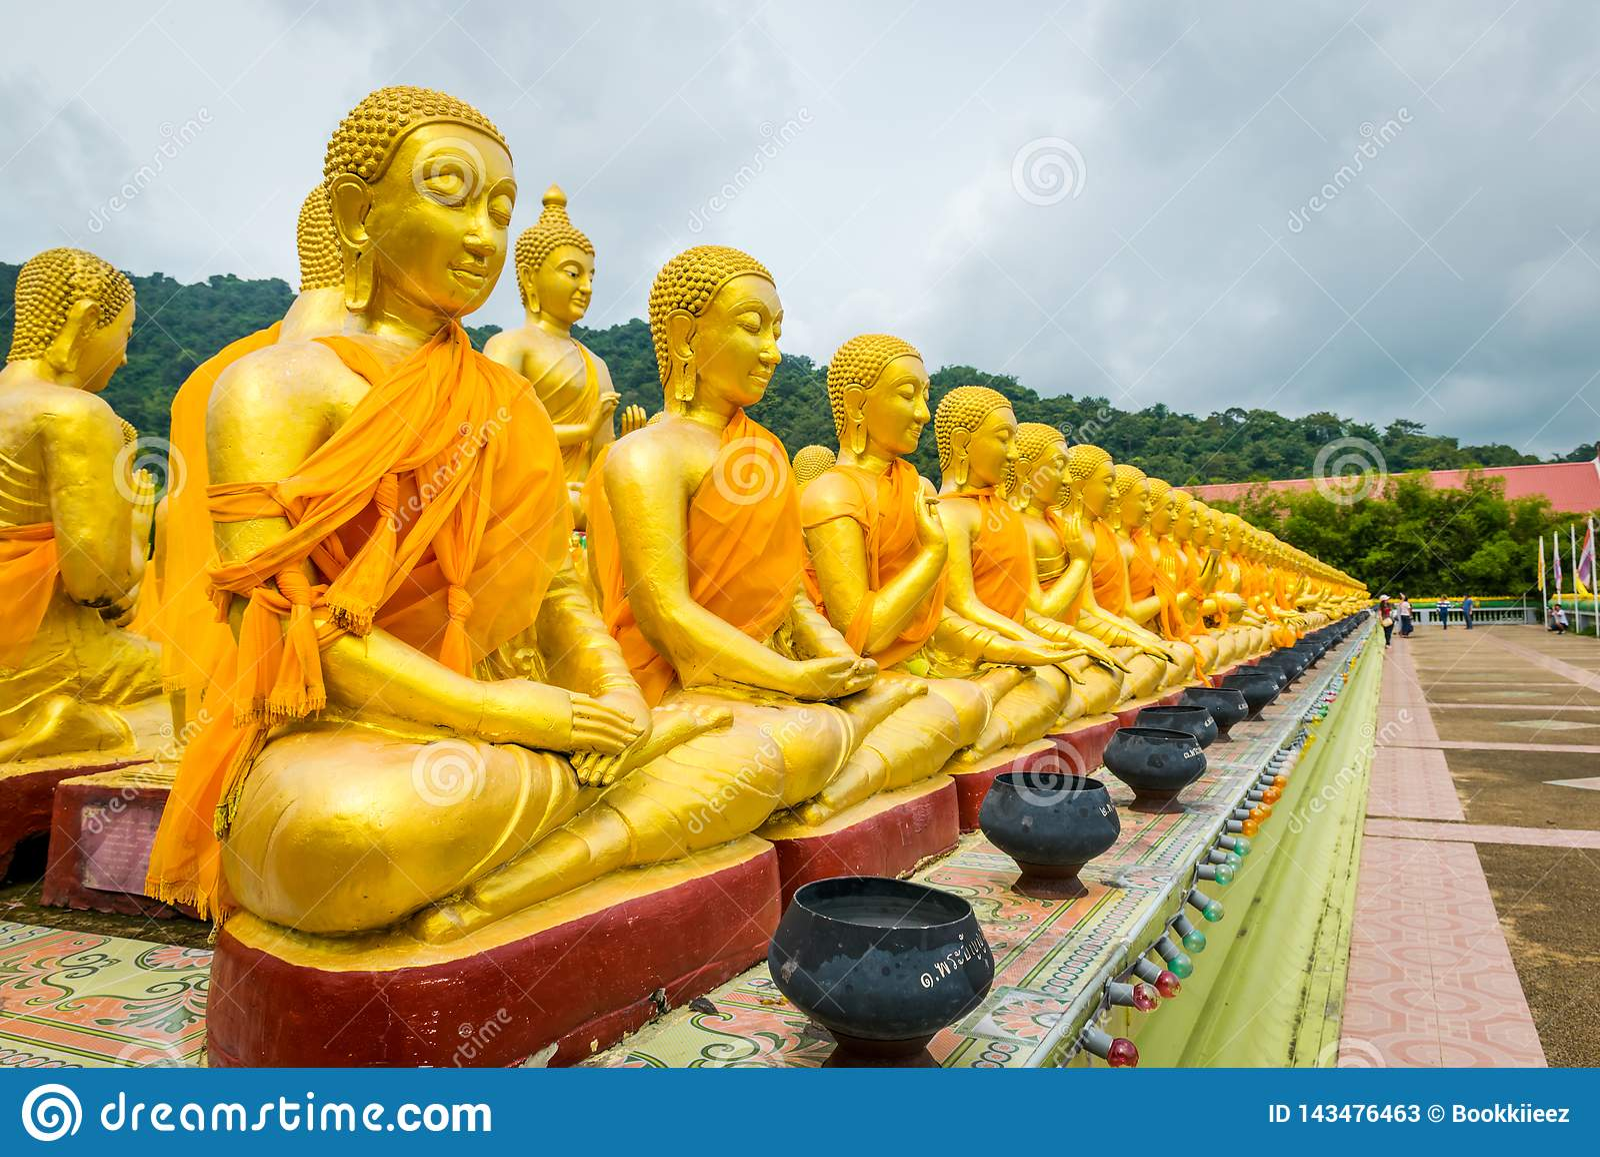 Parque conmemorativo budista de Makha Bucha en Nakhon Nayok, Tailandia